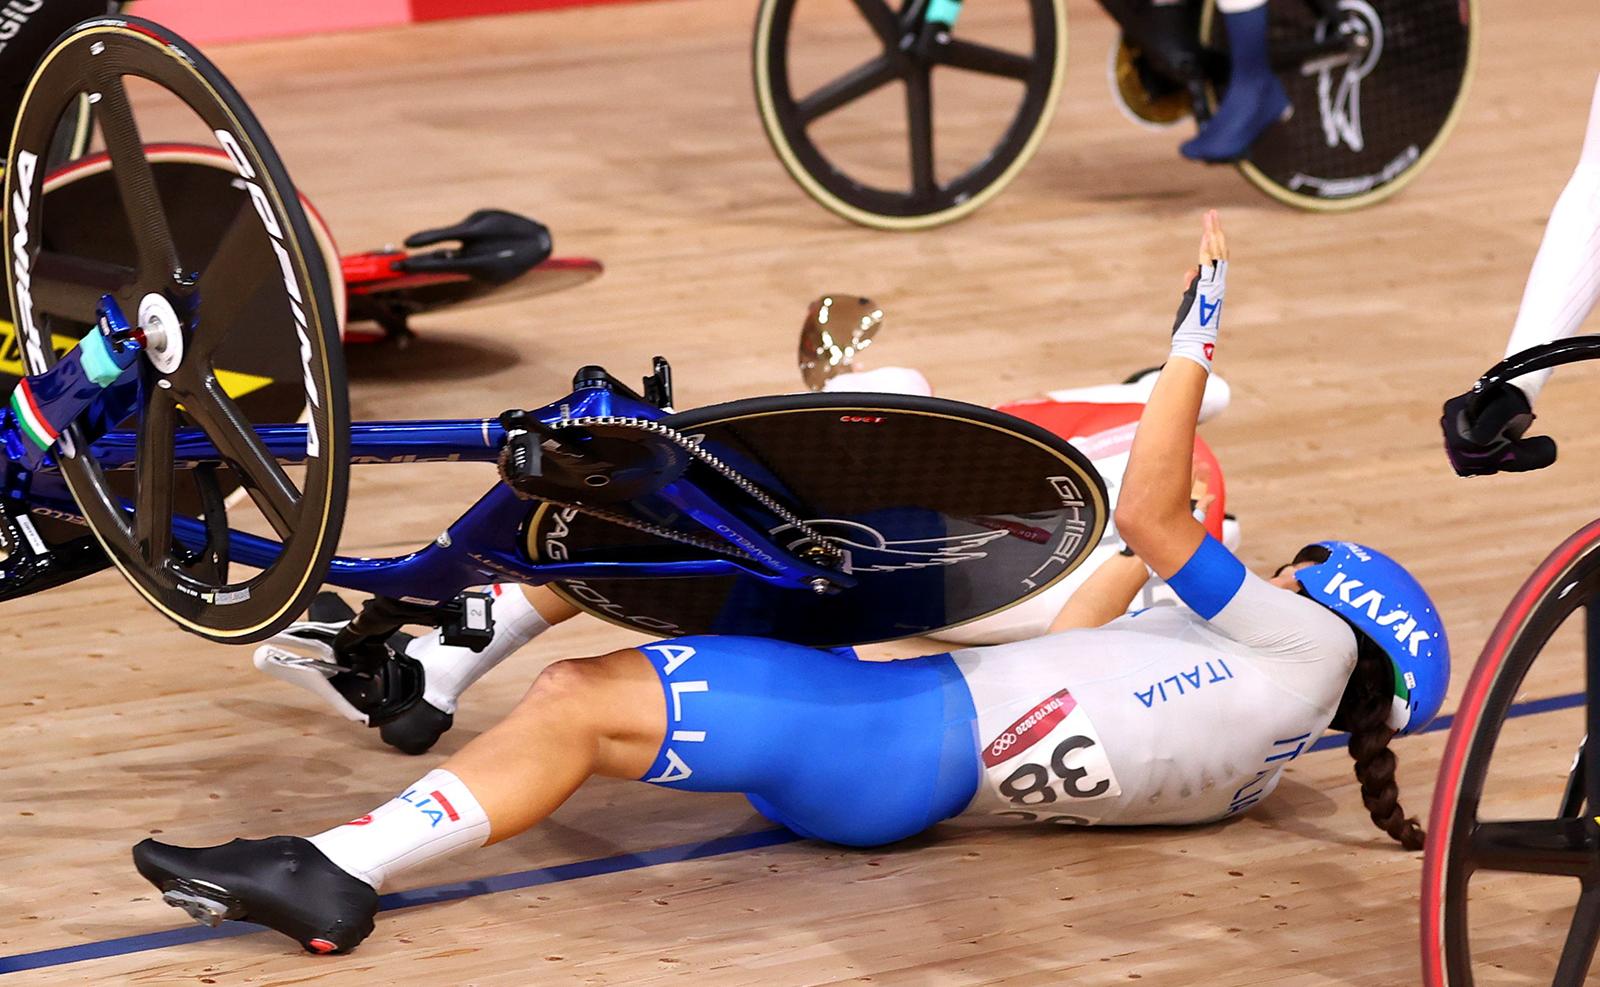 Tokyo 2020 Olympics - Cycling - Track - Women's Omnium - Scratch Race - Izu Velodrome, Shizuoka, Japan - August 8, 2021. Elisa Balsamo of Italy reacts after a crash. REUTERS